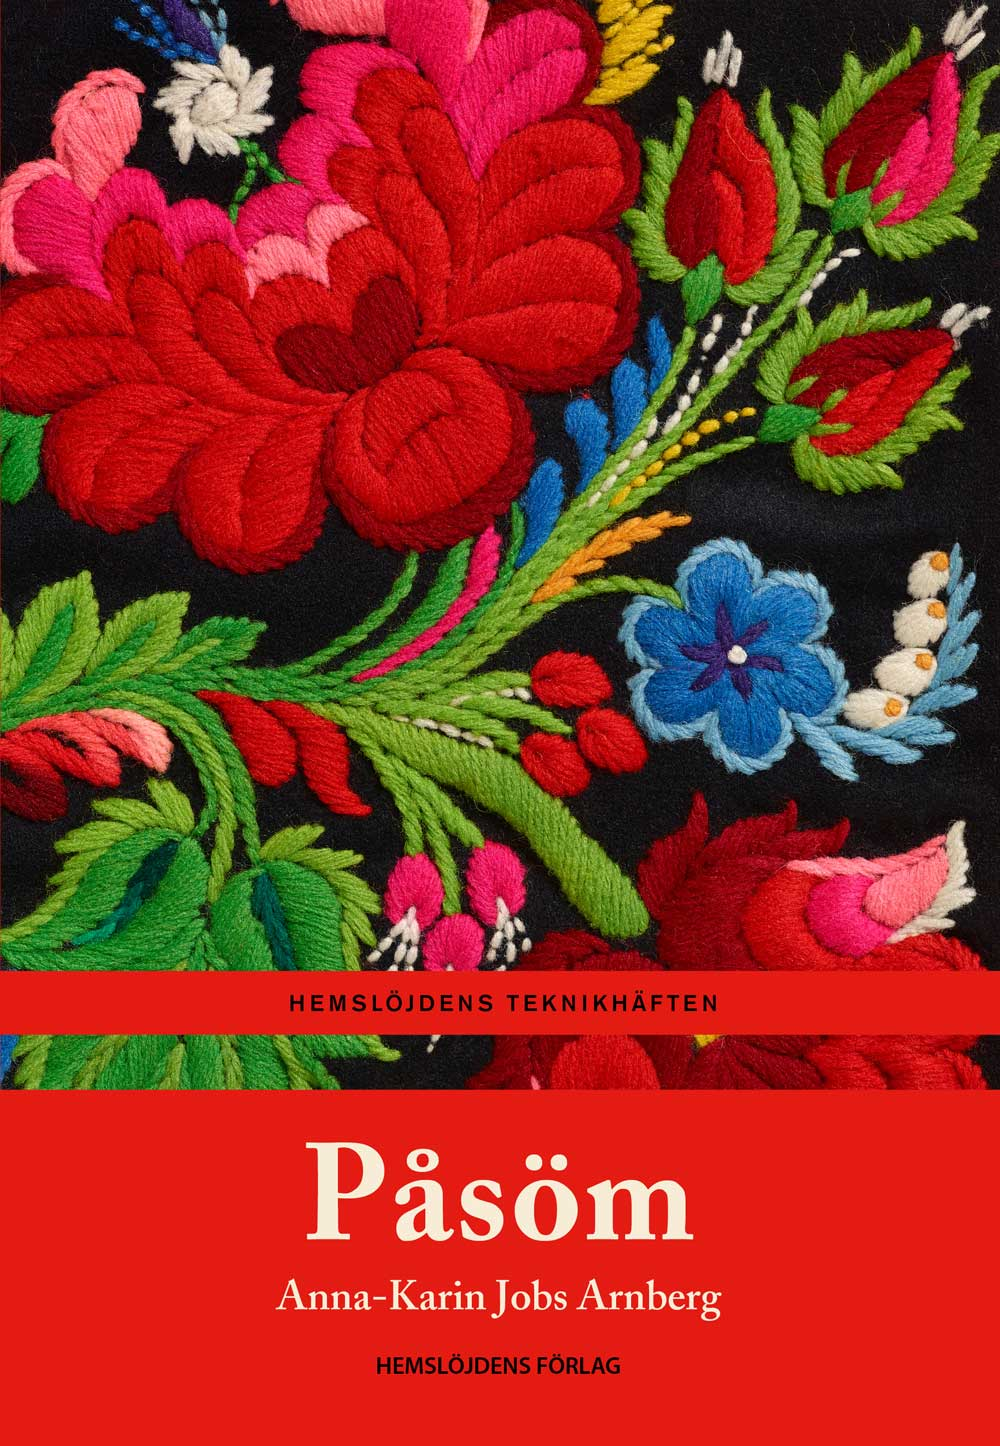 〔Book Hemslojden〕 Pasom